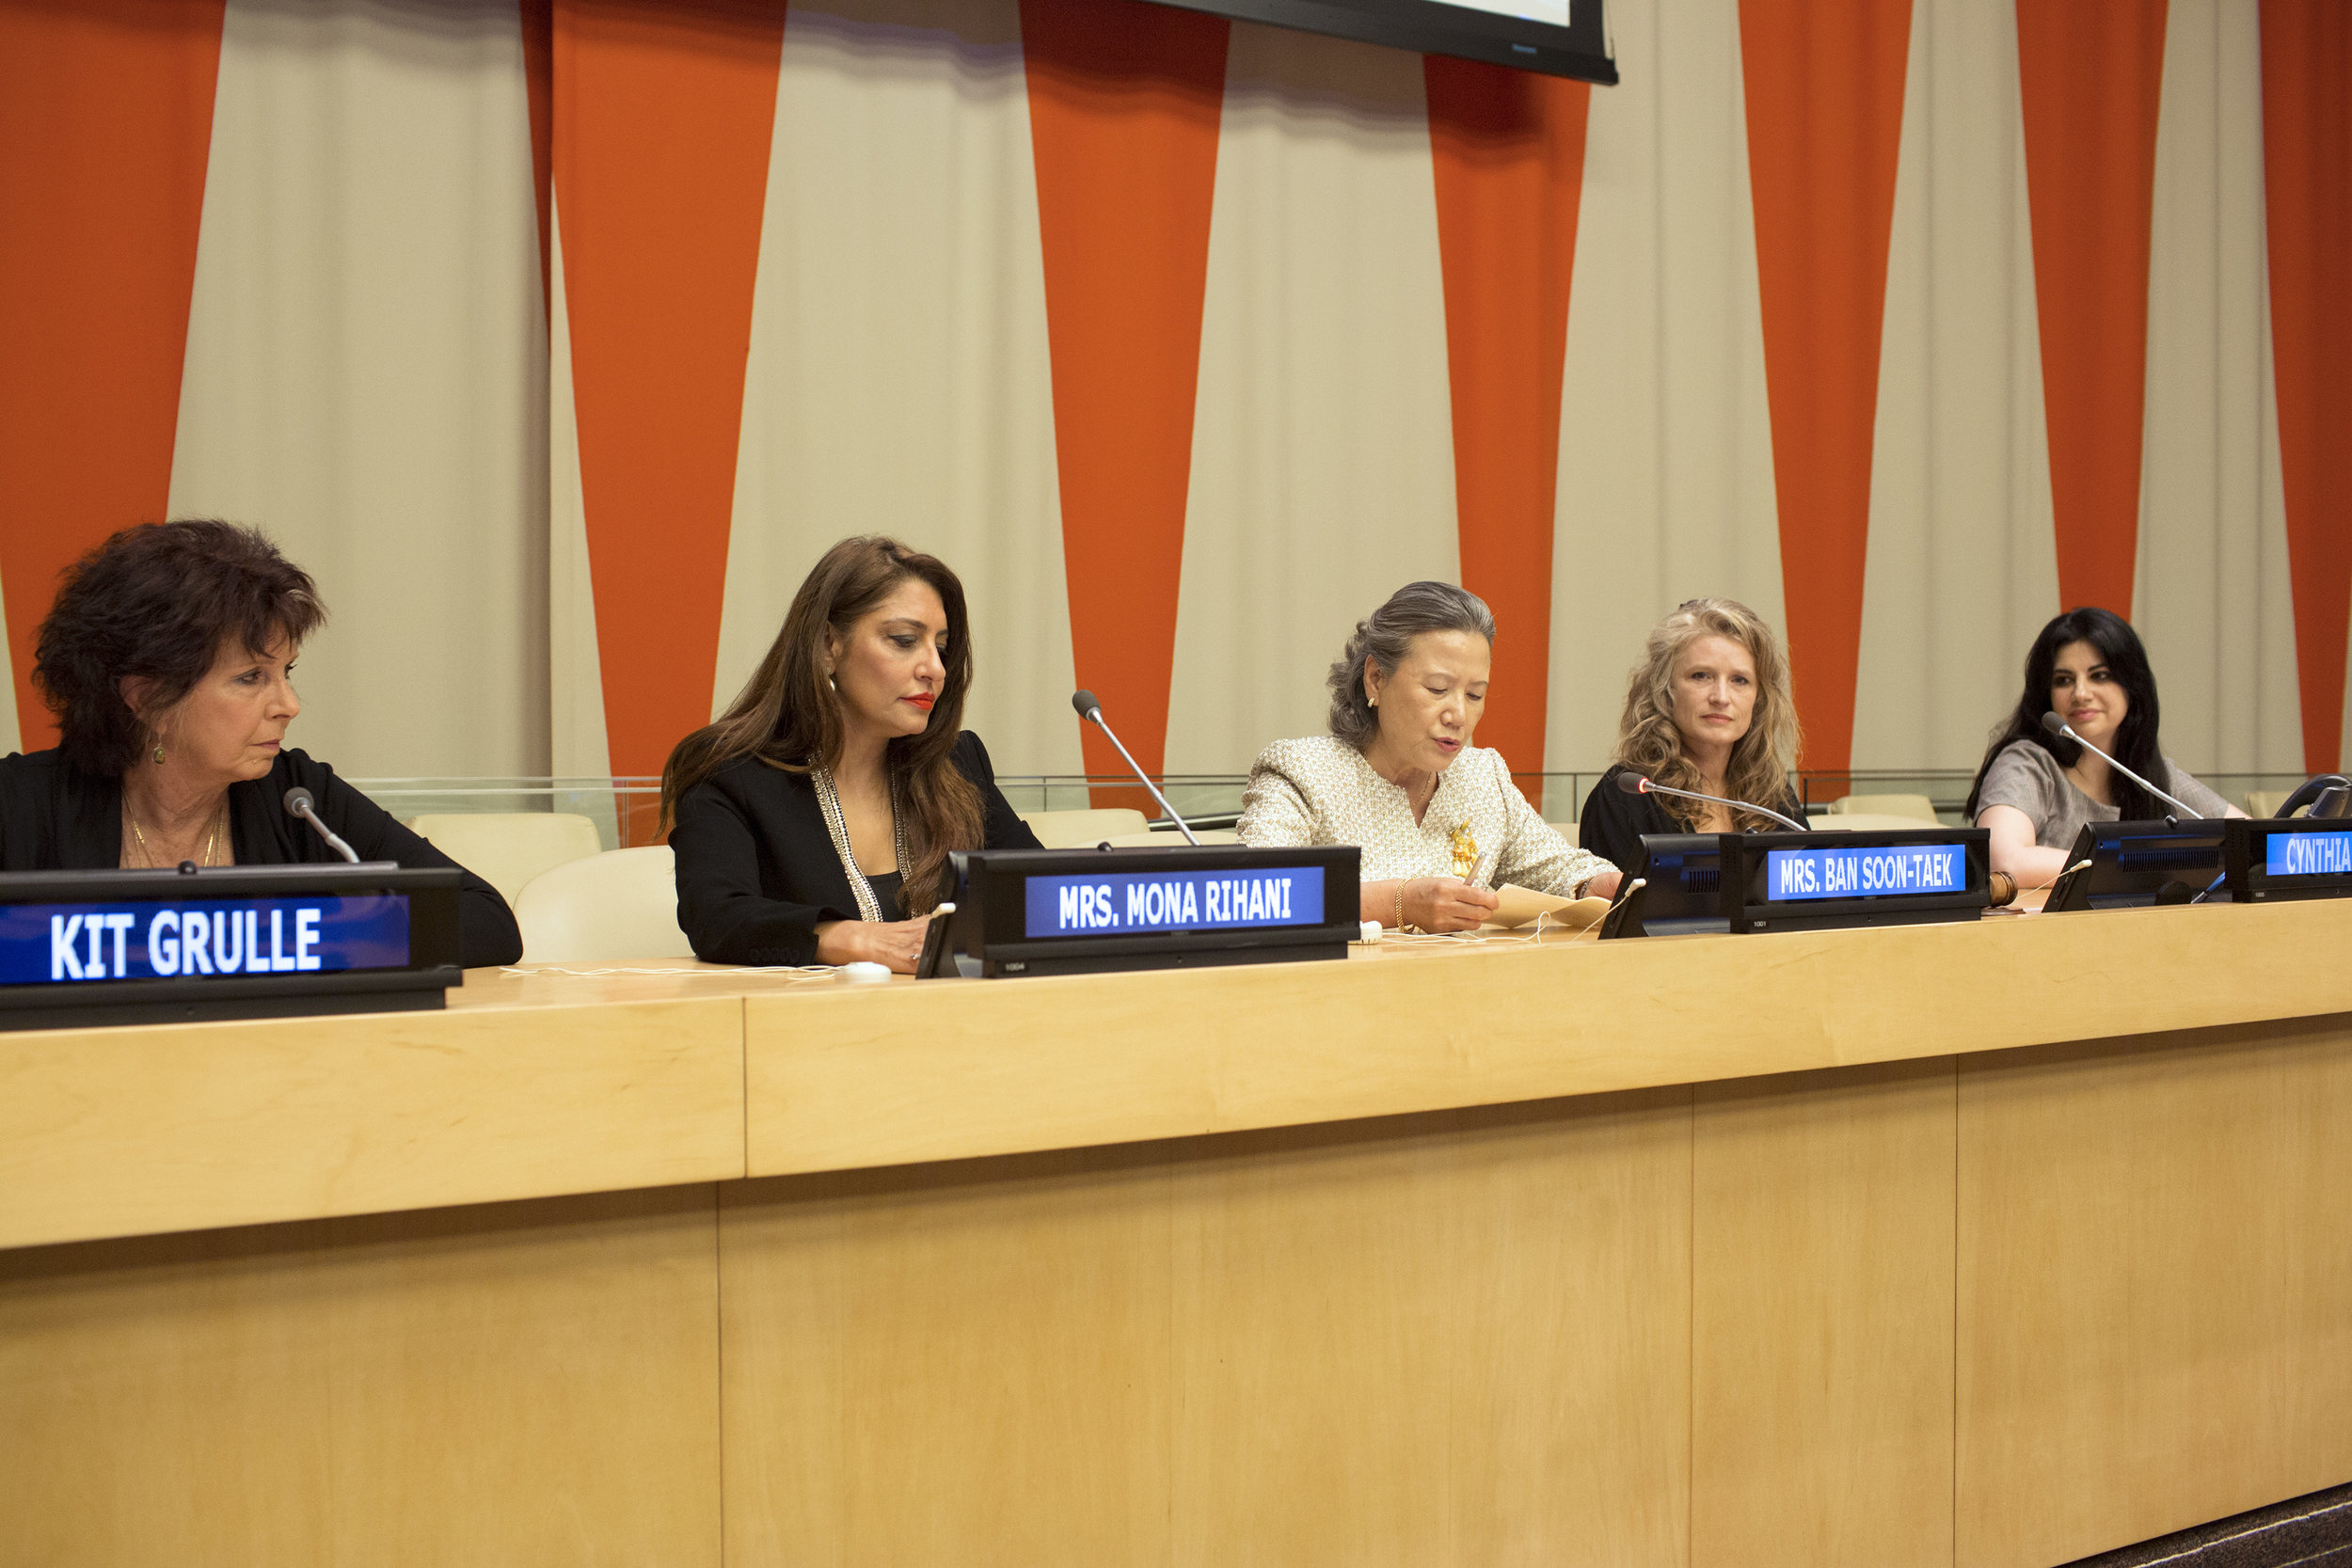 The Speakers Panel- Kit Gruelle, Muna Rihani Al-Nasser, H.E. Ban Soon-taek,  Filmmaker Cynthia Hill and Elizabeth Flores U.N. Ambassador of Honduras A.JPG